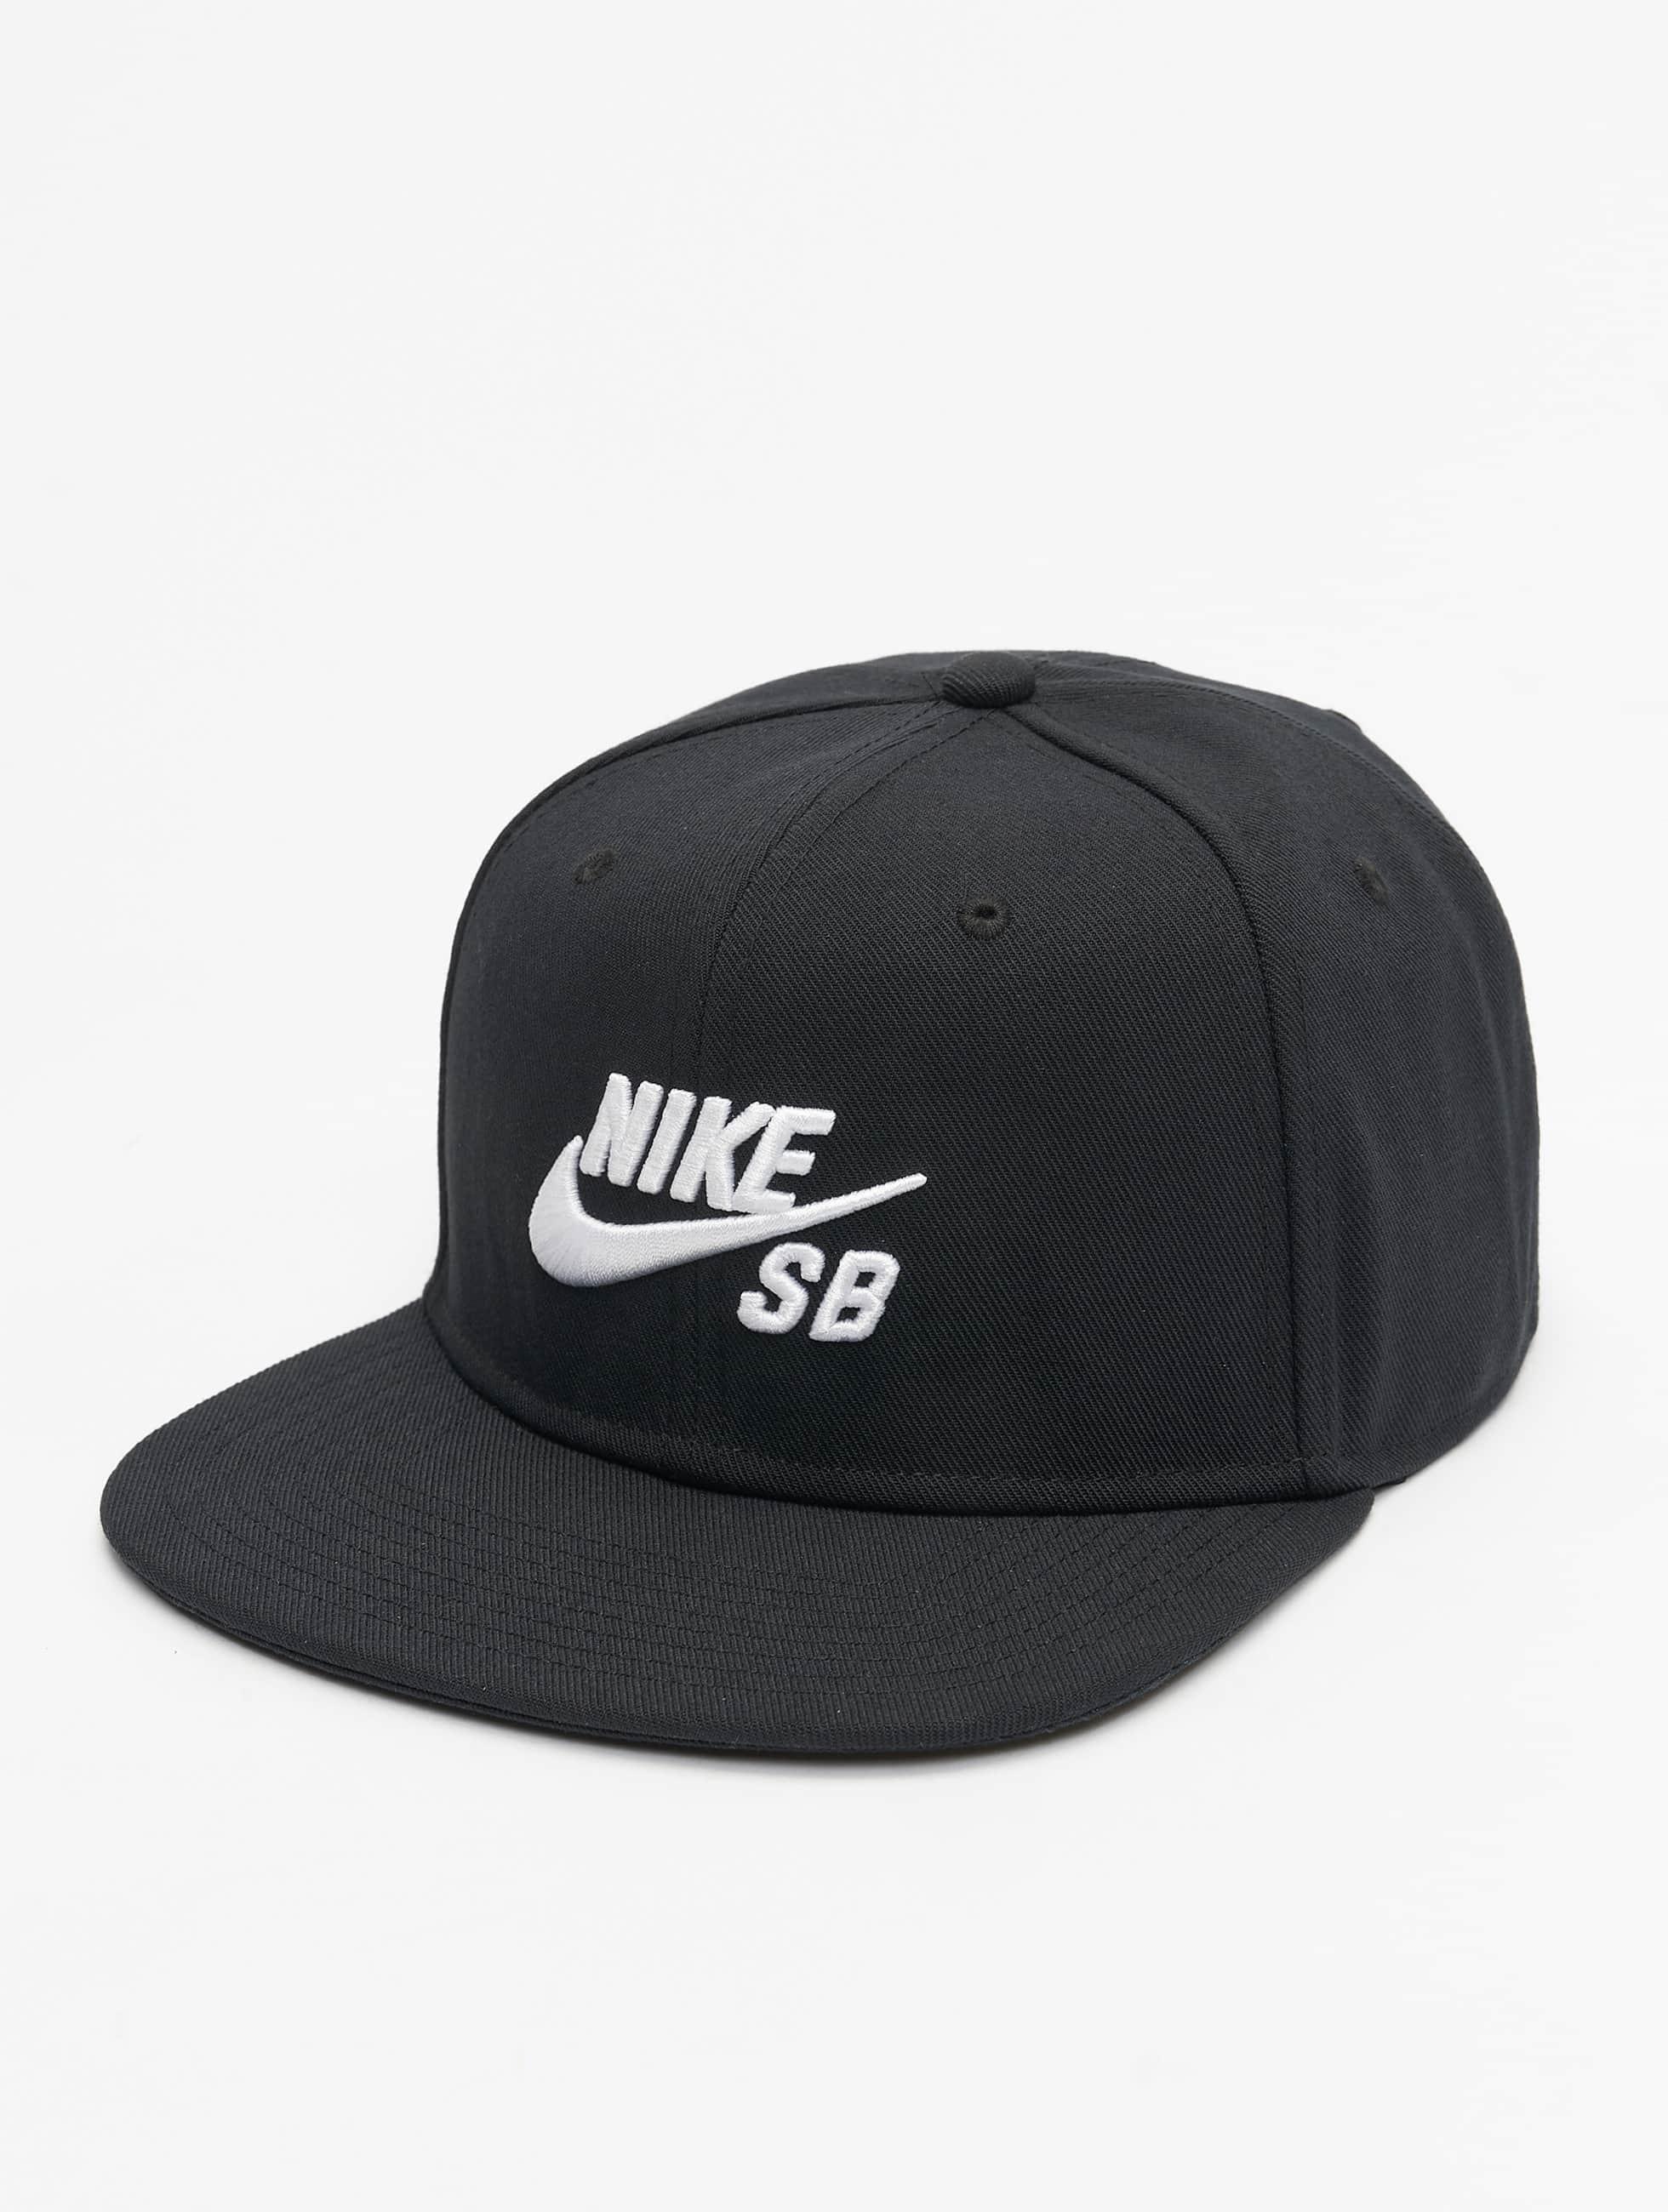 Nike SB Männer,Frauen Snapback Cap SB Icon Pro in schwarz